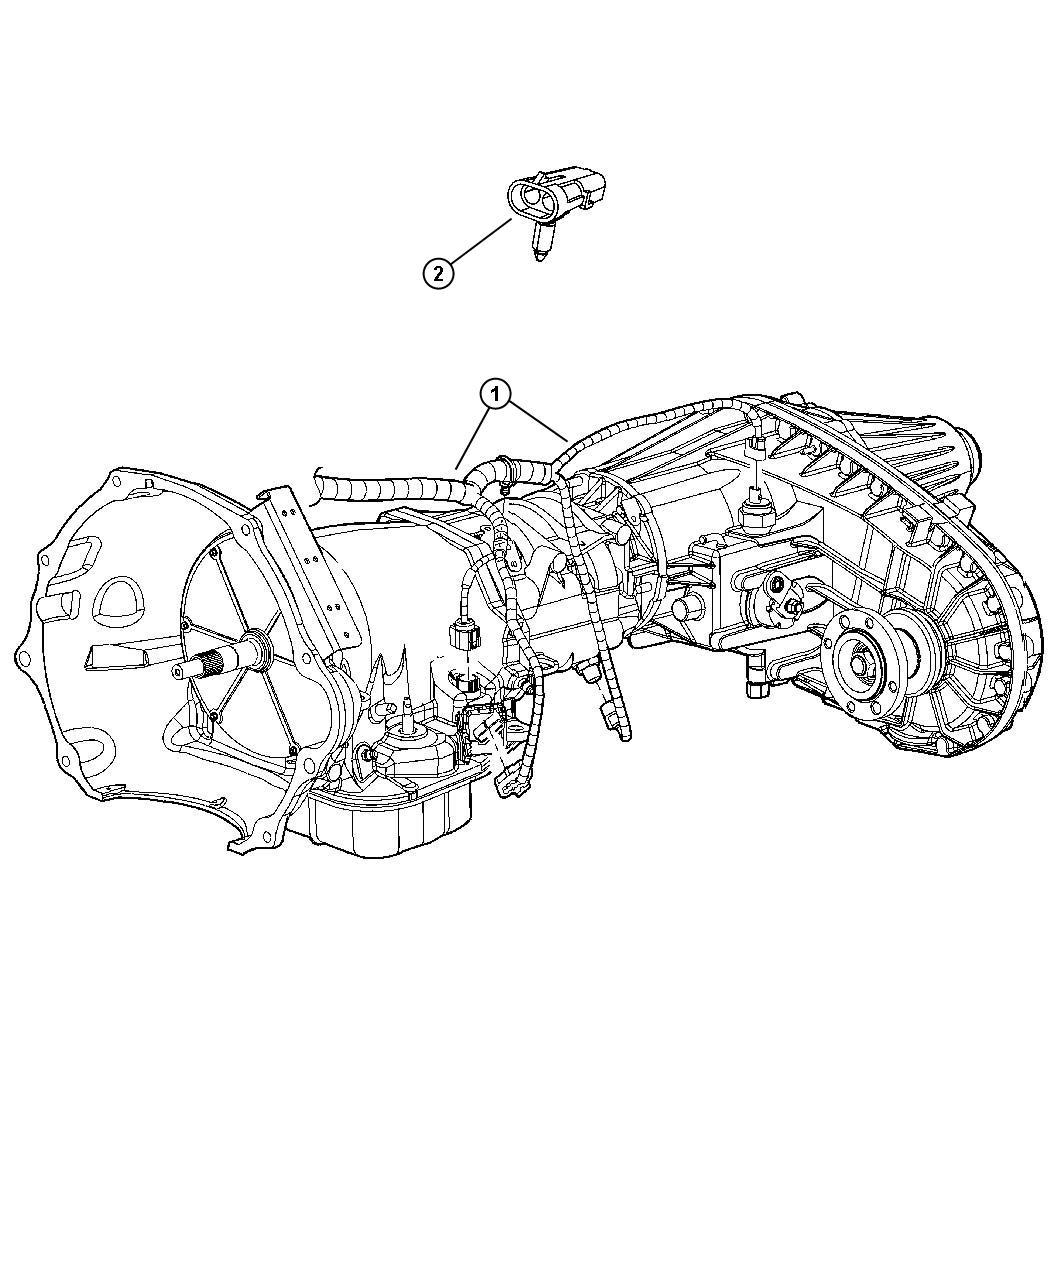 Dodge Ram Wiring Transmission Case Transfer State